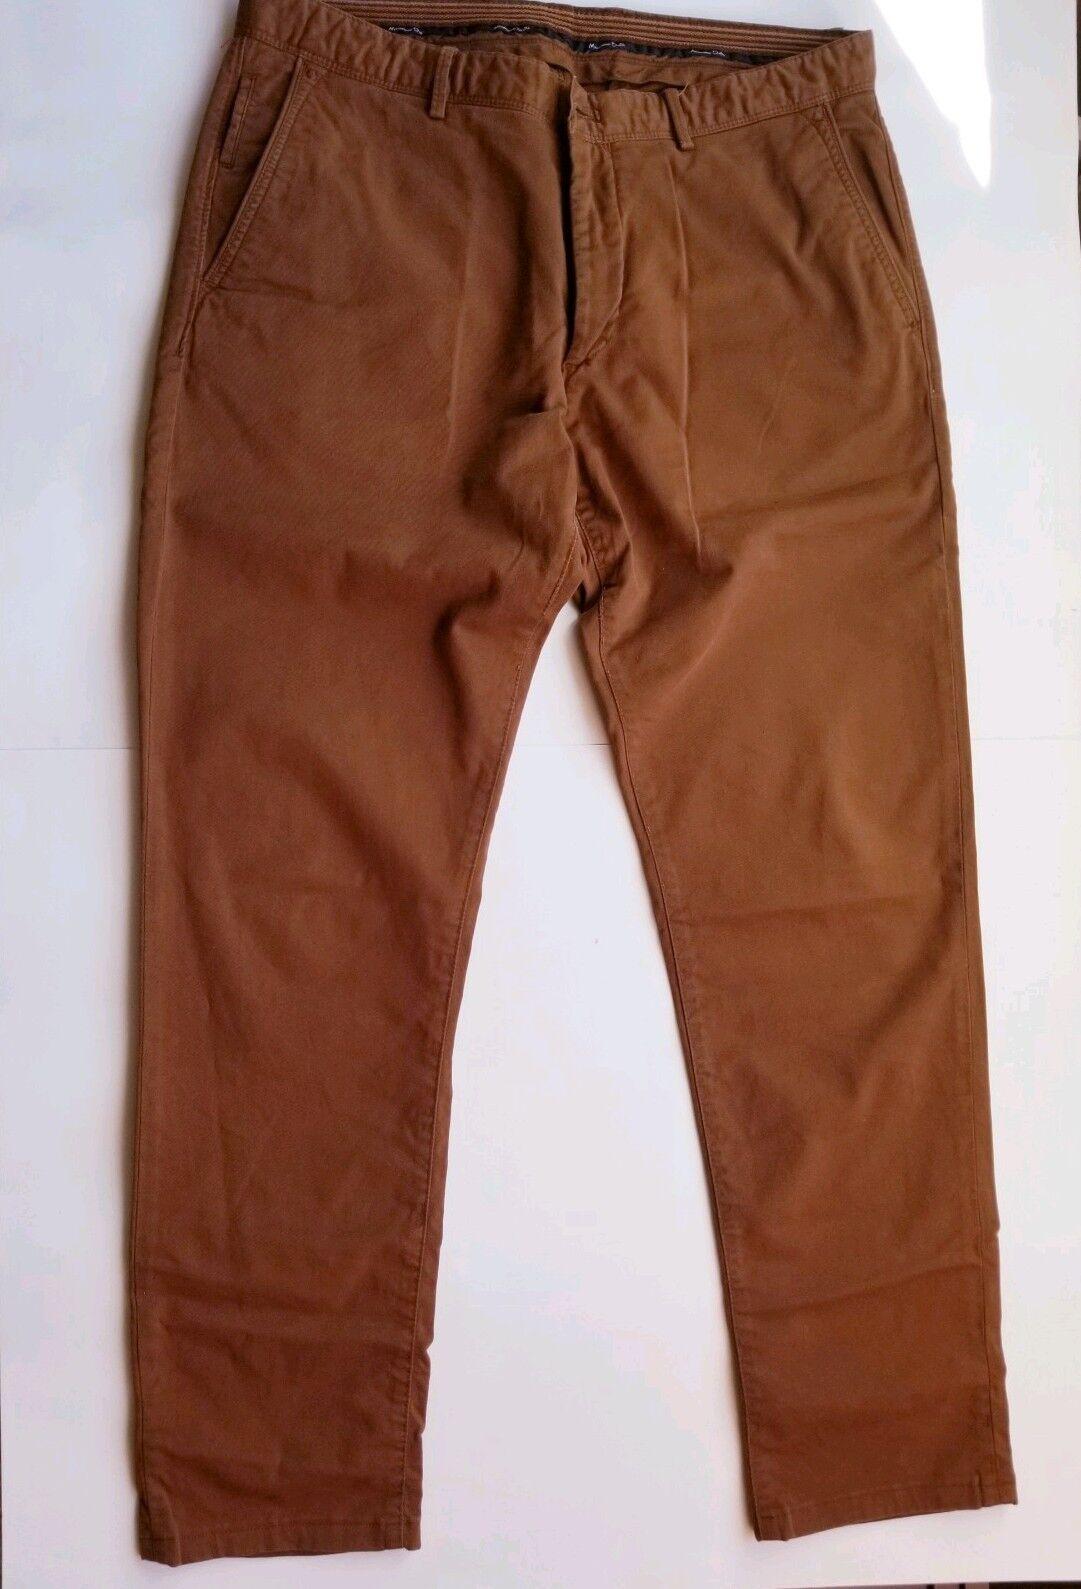 Massimo Dutti Men Slim Fit Red Clay Khaki Pants    size 32.